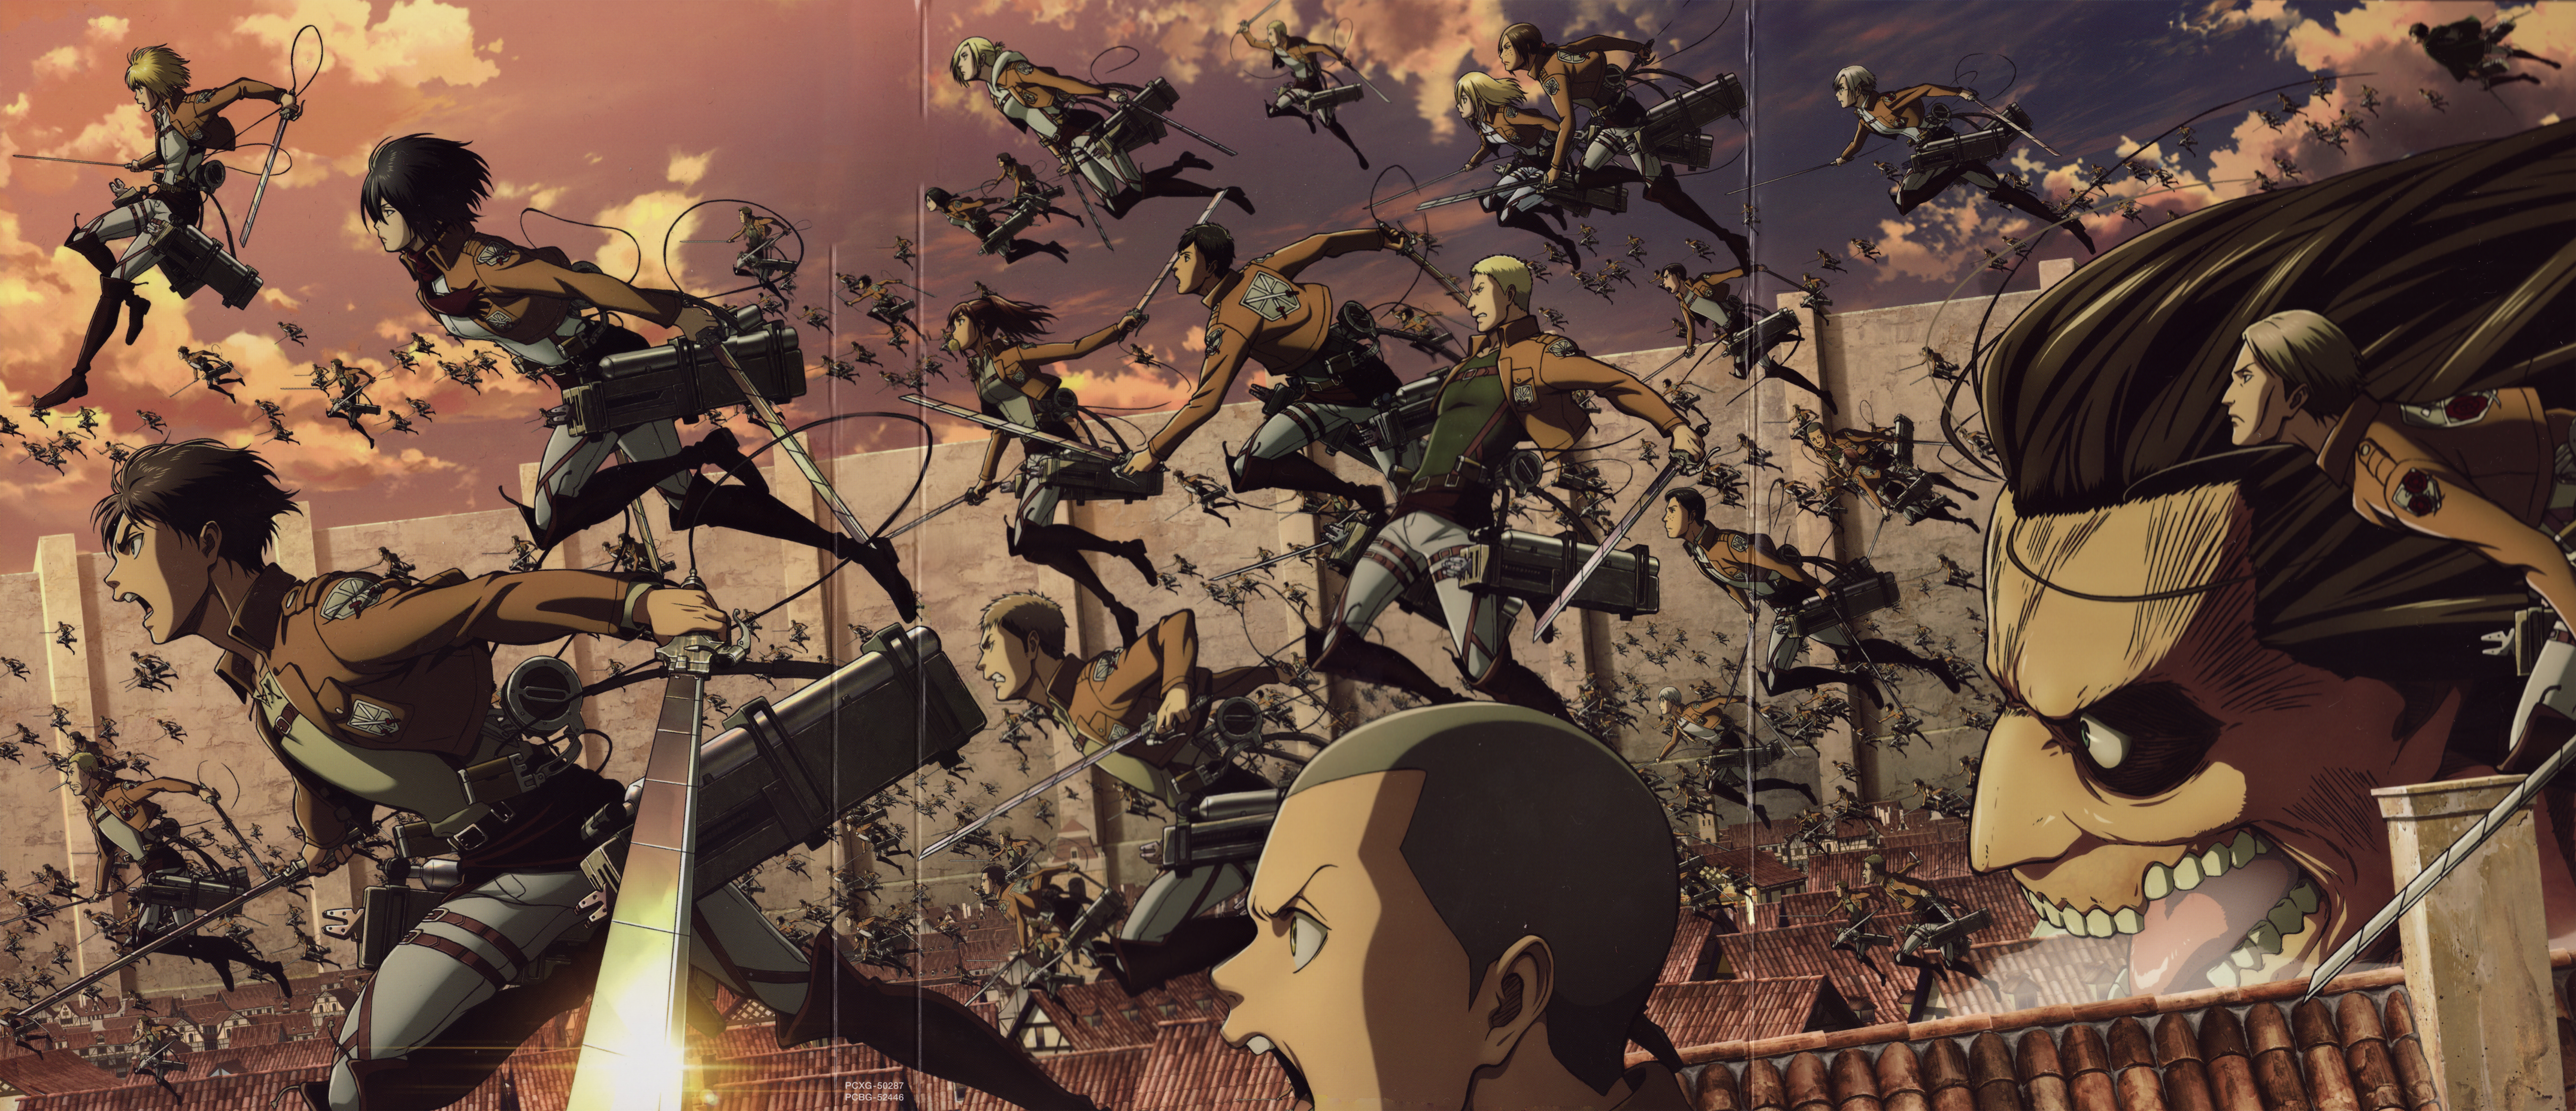 Attack On Titan Season 2 Wallpaper Posted By Sarah Tremblay